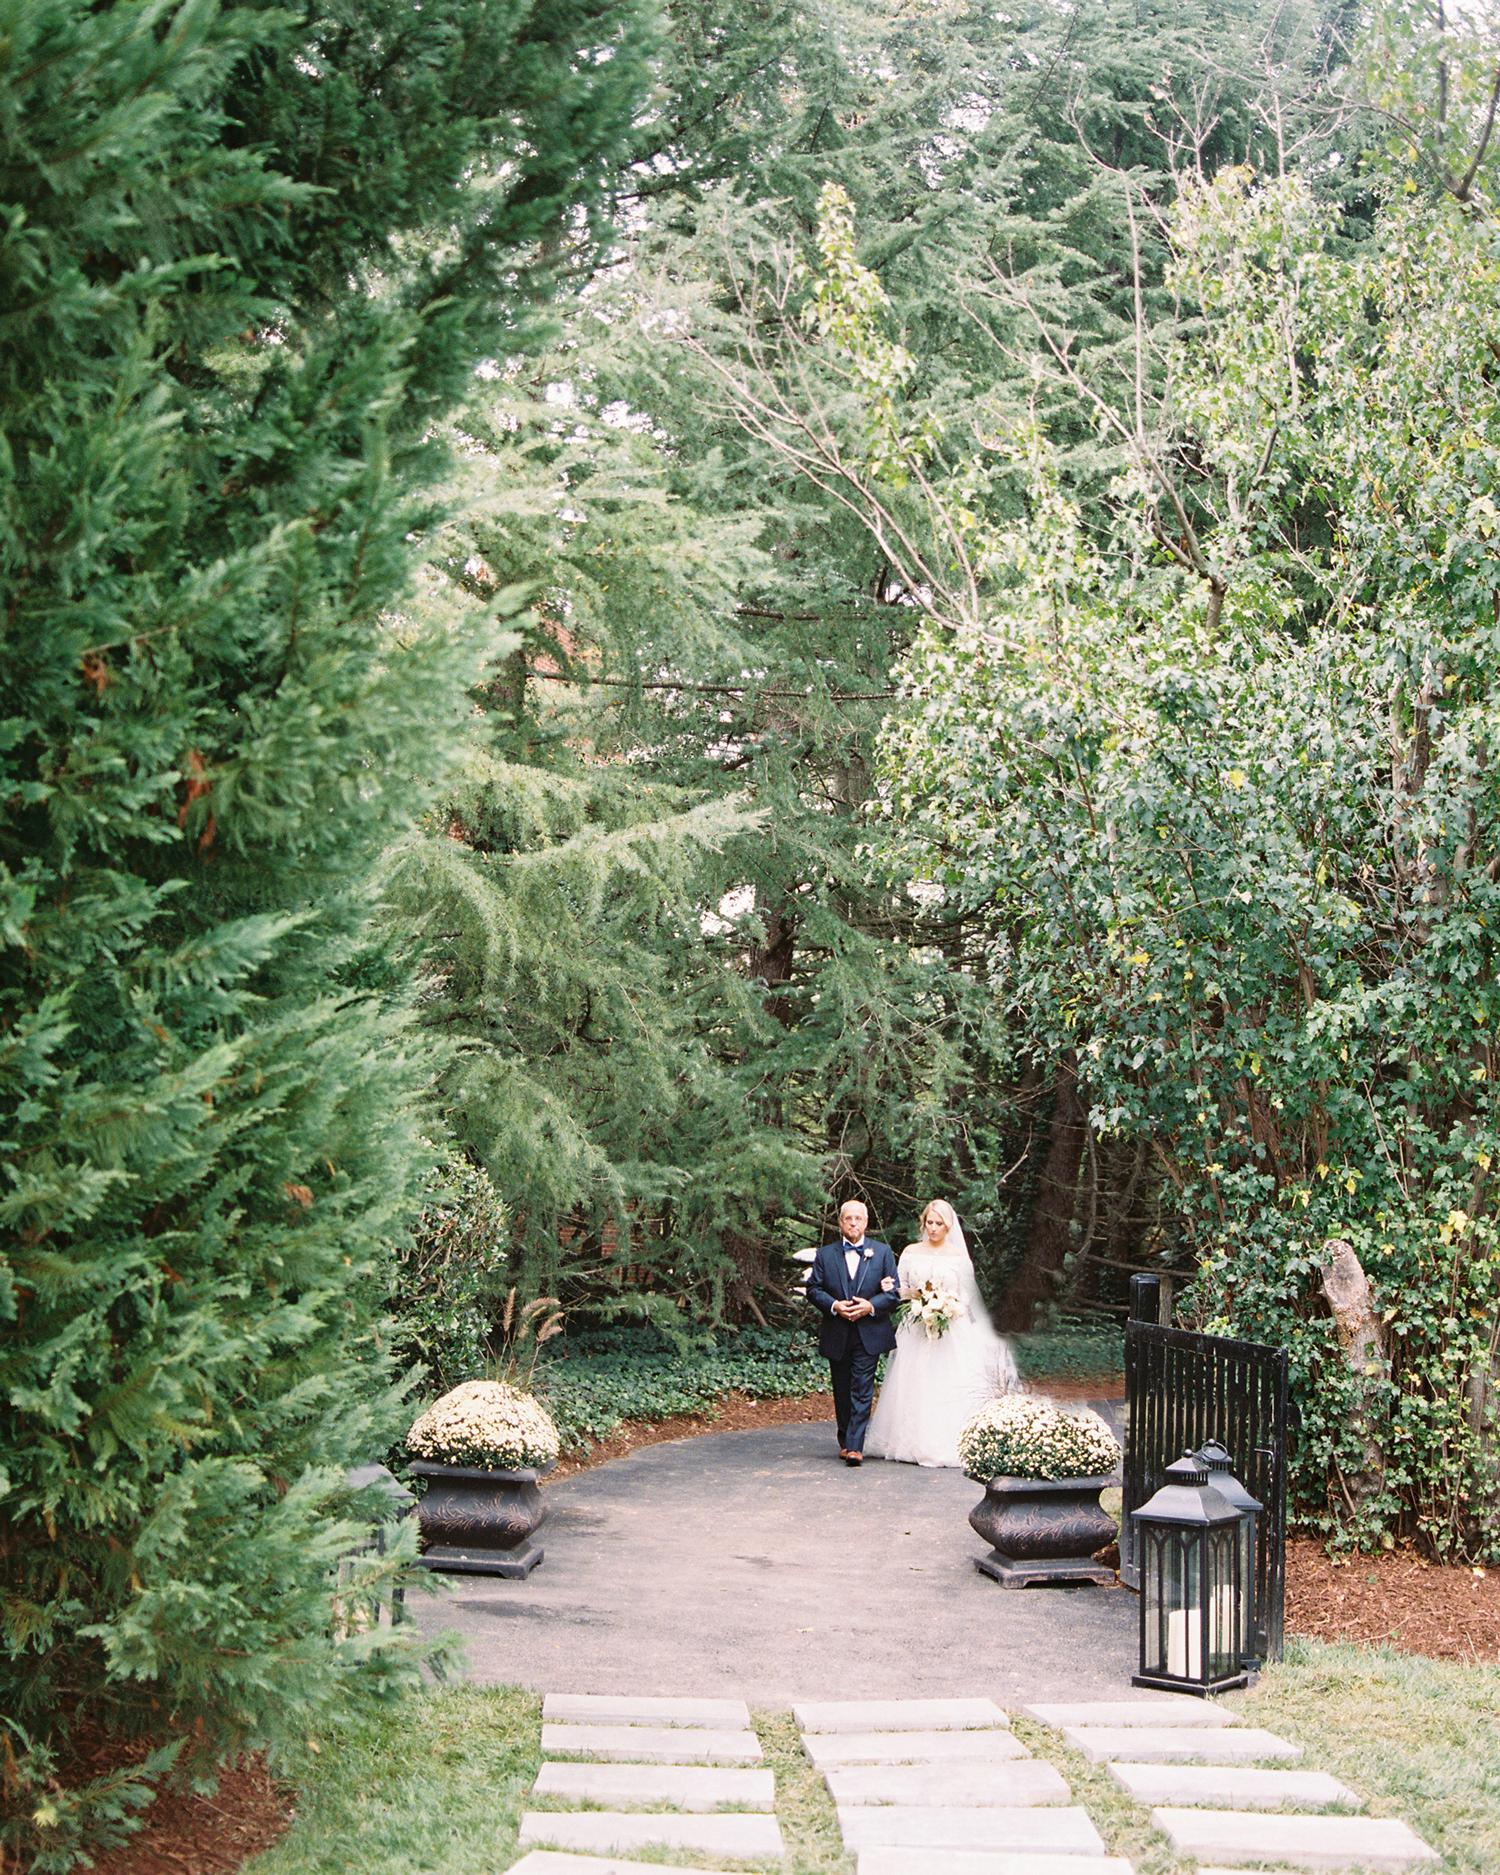 kendall nick wedding processional